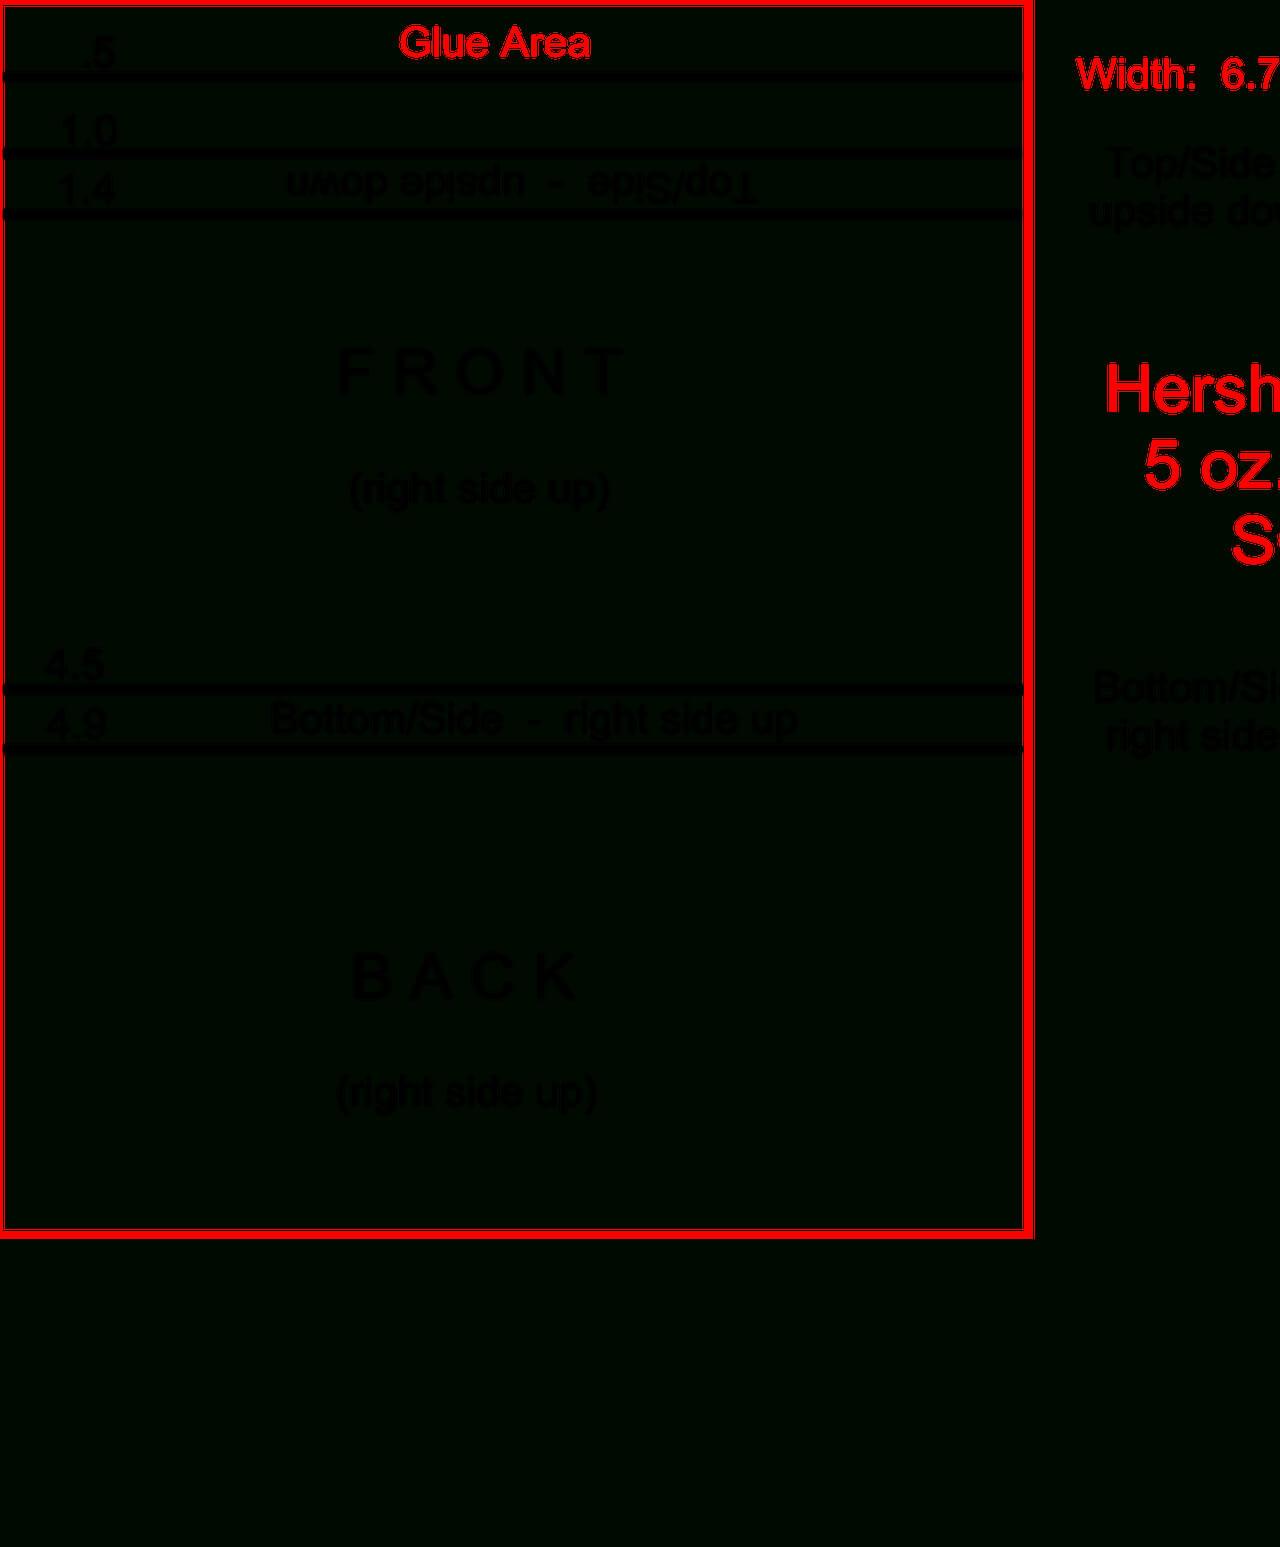 Hershey Candy Bar Wrapper Template - Free Download   Candy With Regard To Candy Bar Wrapper Template Microsoft Word